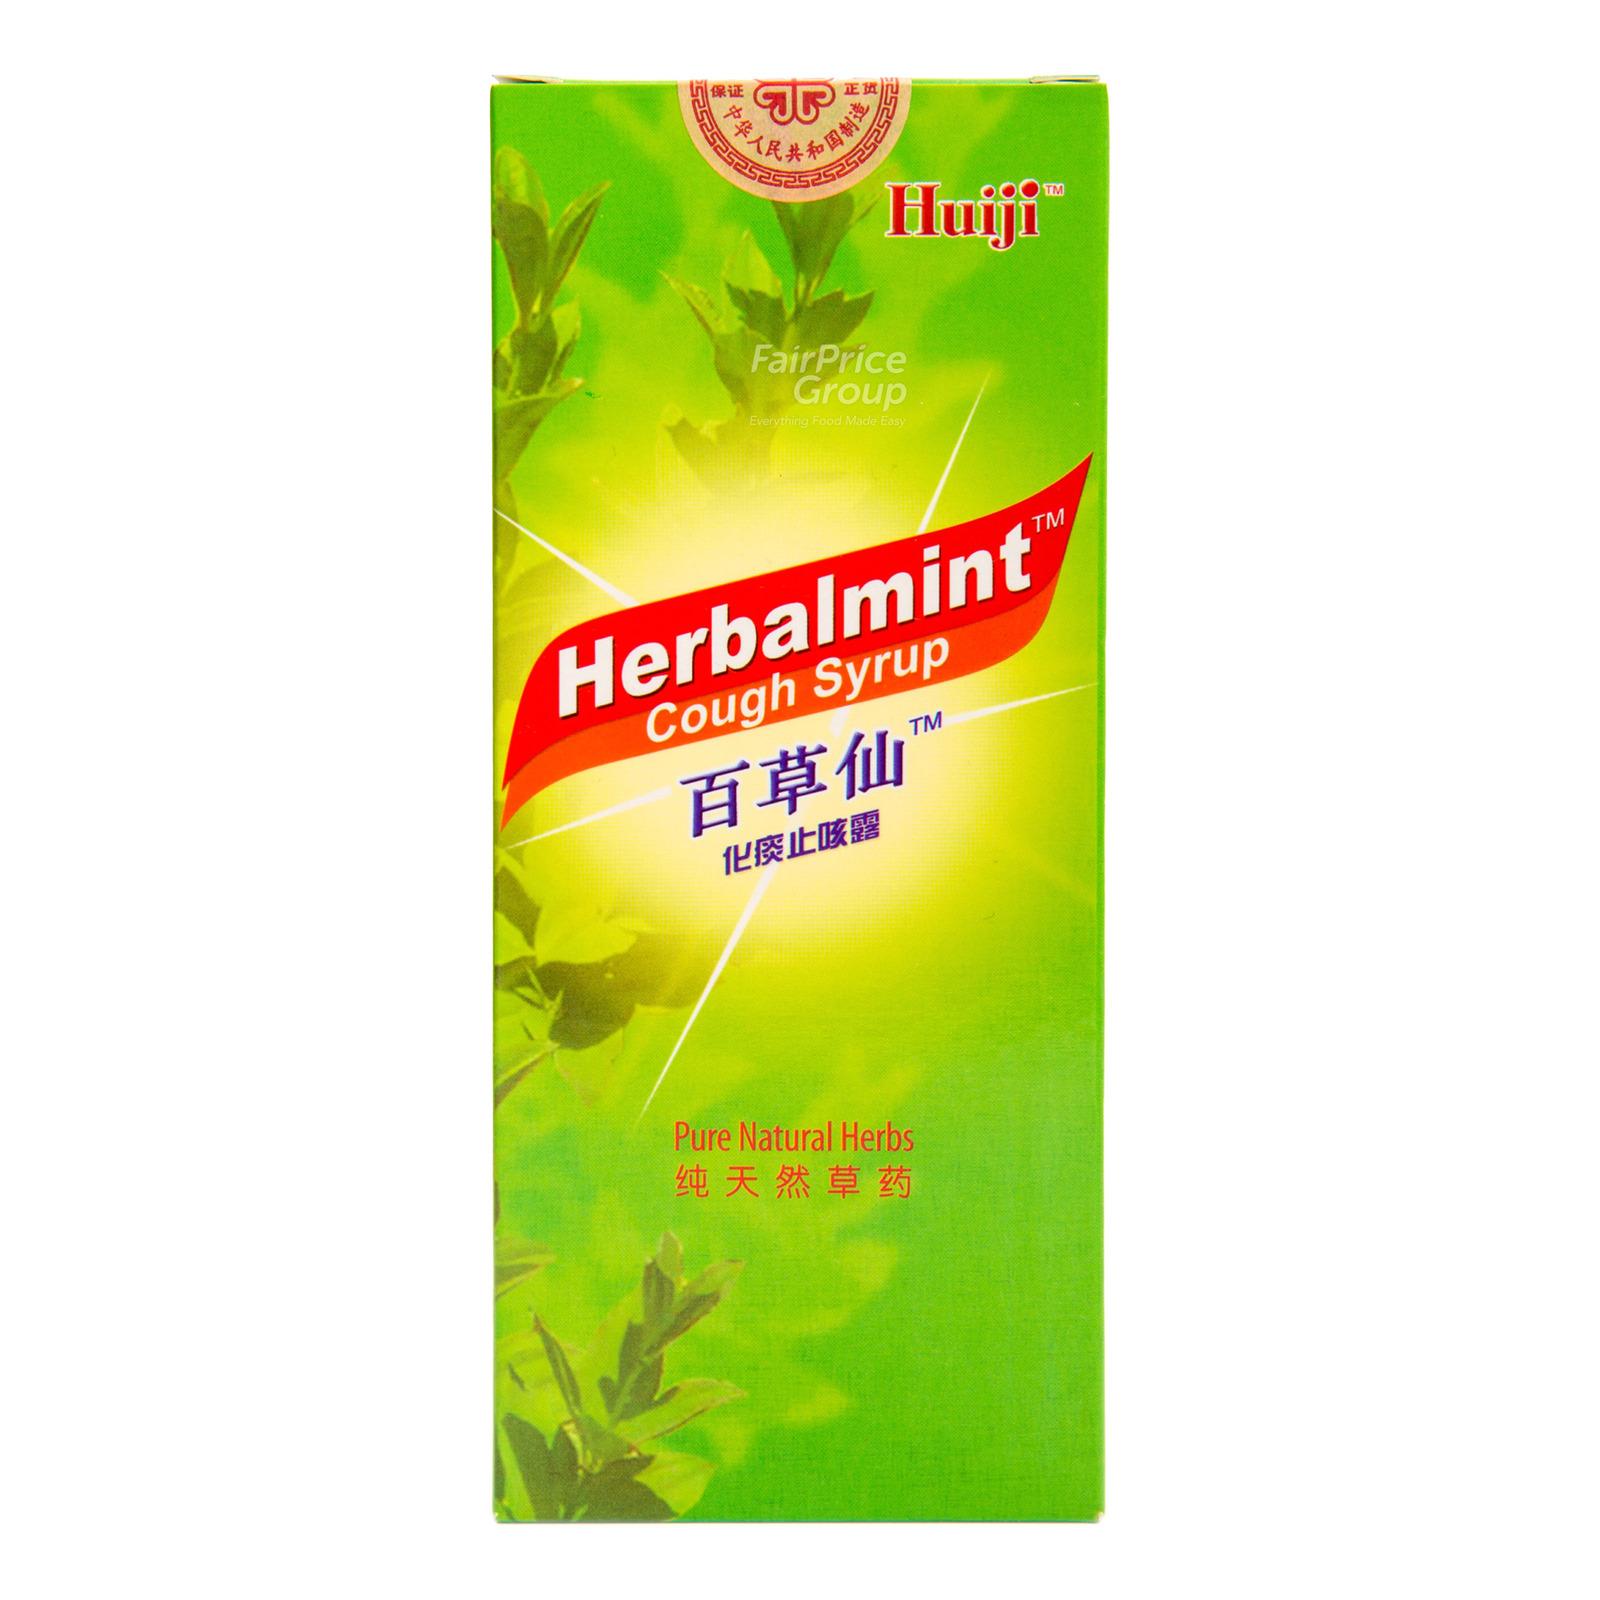 Huiji Herbalmint Cough Syrup